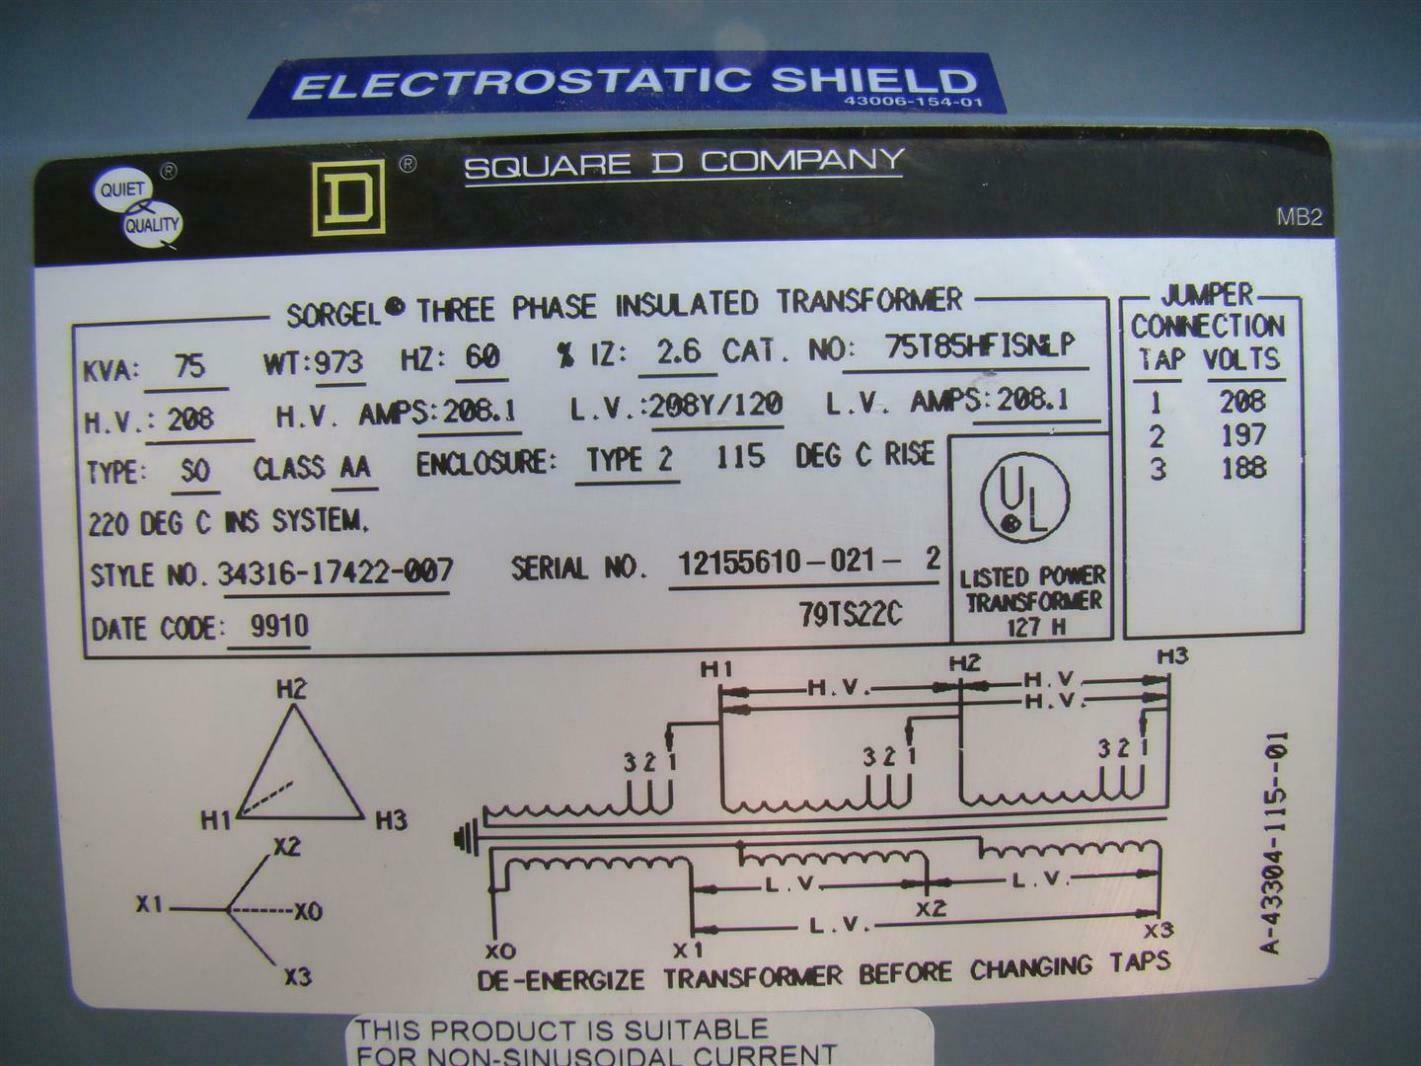 480 Volt 3 Phase Wiring Diagram Likewise 480 Volt 3 Phase Transformer